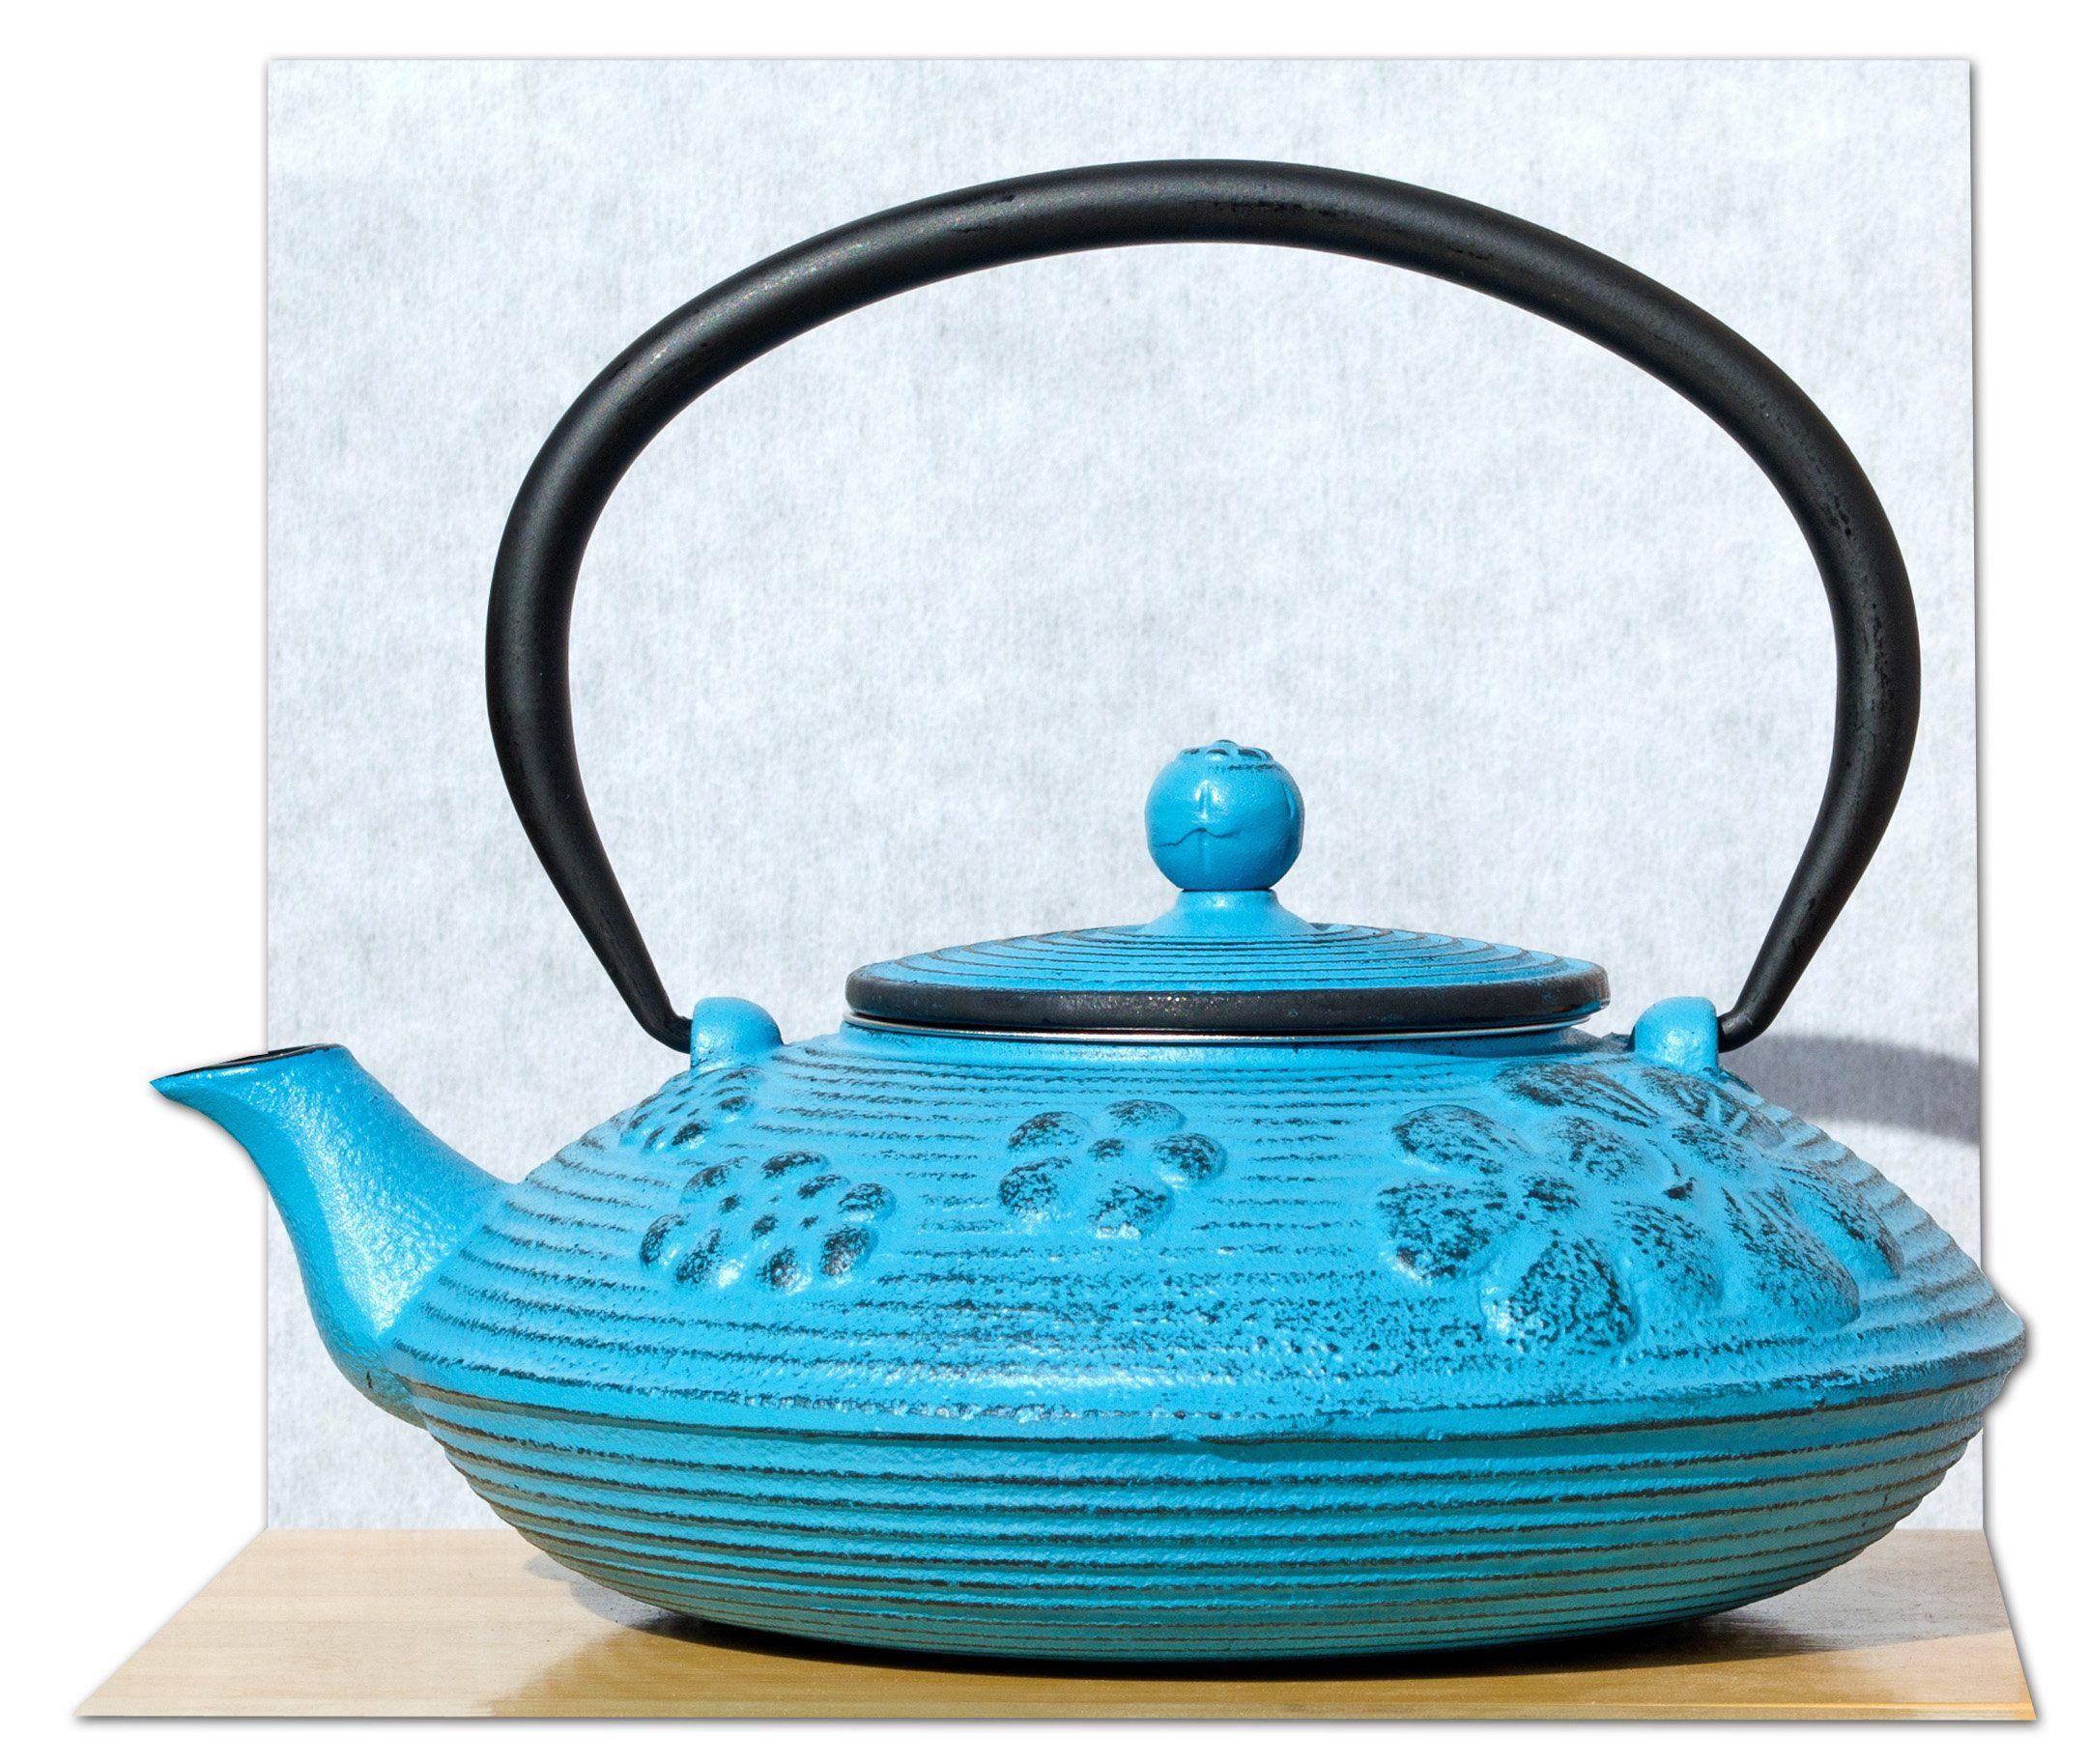 Tetsubin Style Cast Iron Teapot Kettle With Light Blue Spring Flower Design 0 8 Litre Tea Pots Cast Iron Tea Pot Blue Spring Flowers